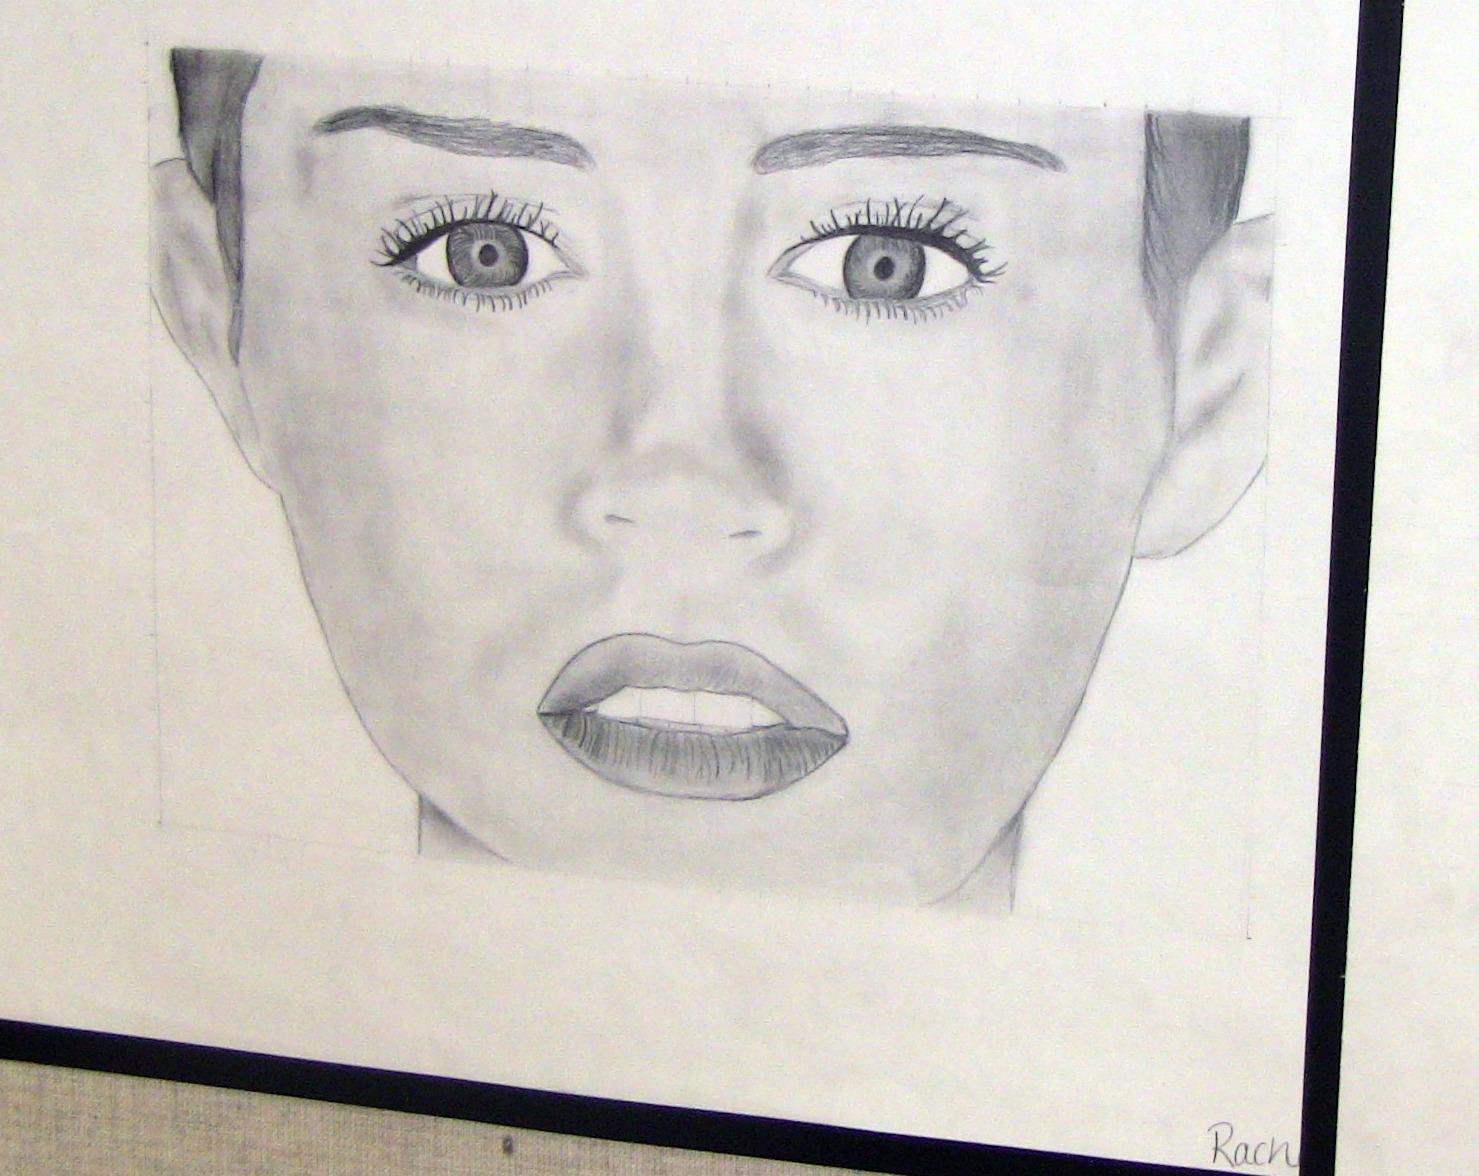 dfee15d58be87838130e_Miley_portrait.jpg